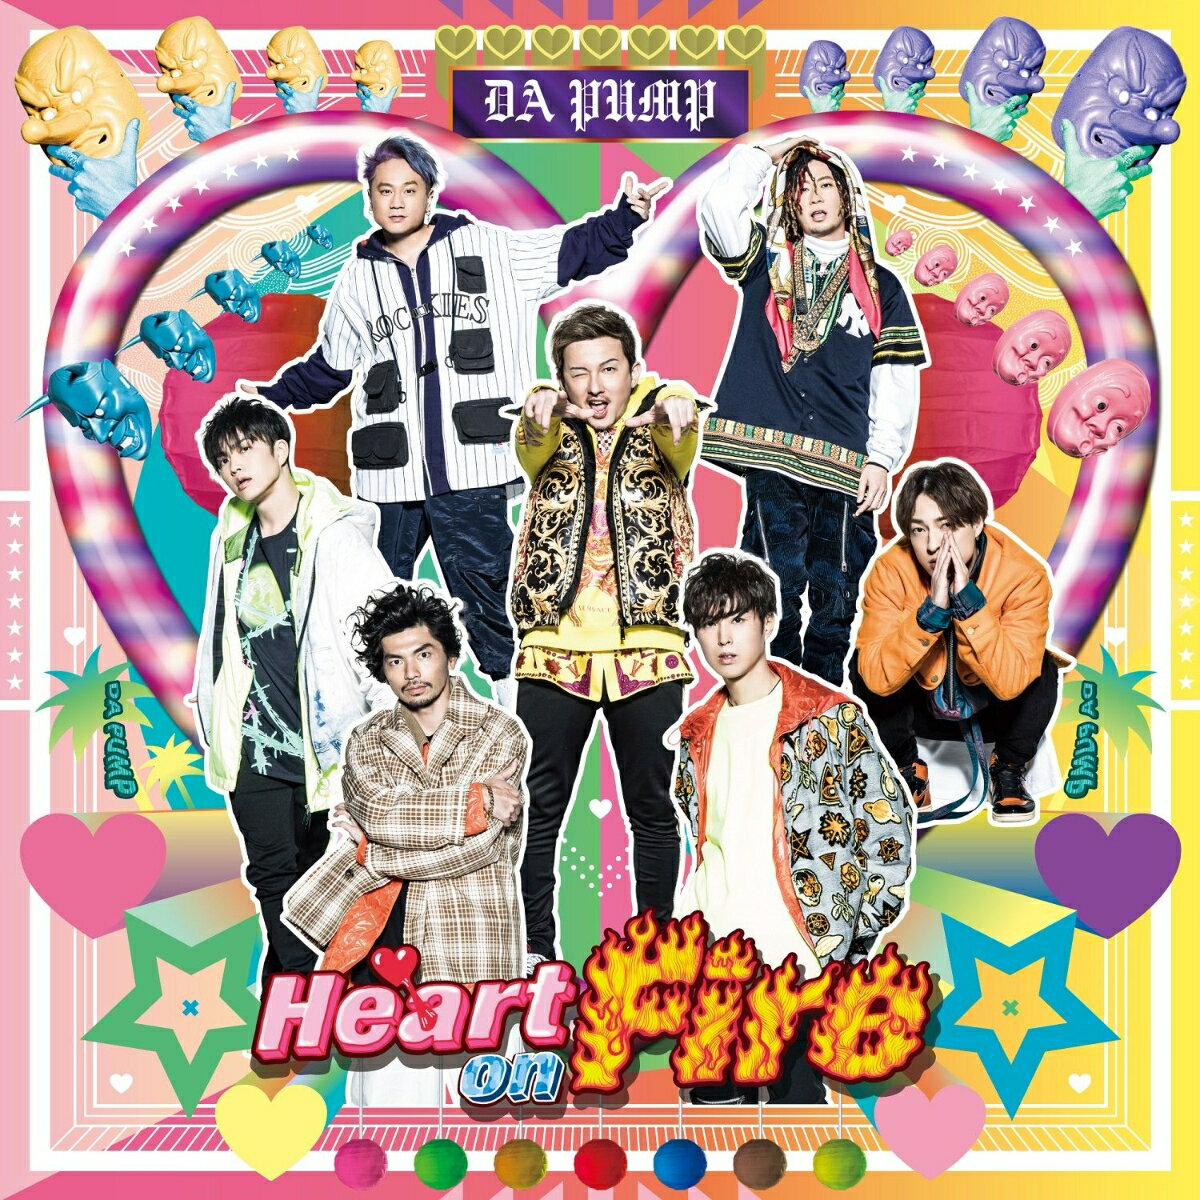 Heart on Fire (初回限定盤 CD+Blu-ray+スマプラ)画像